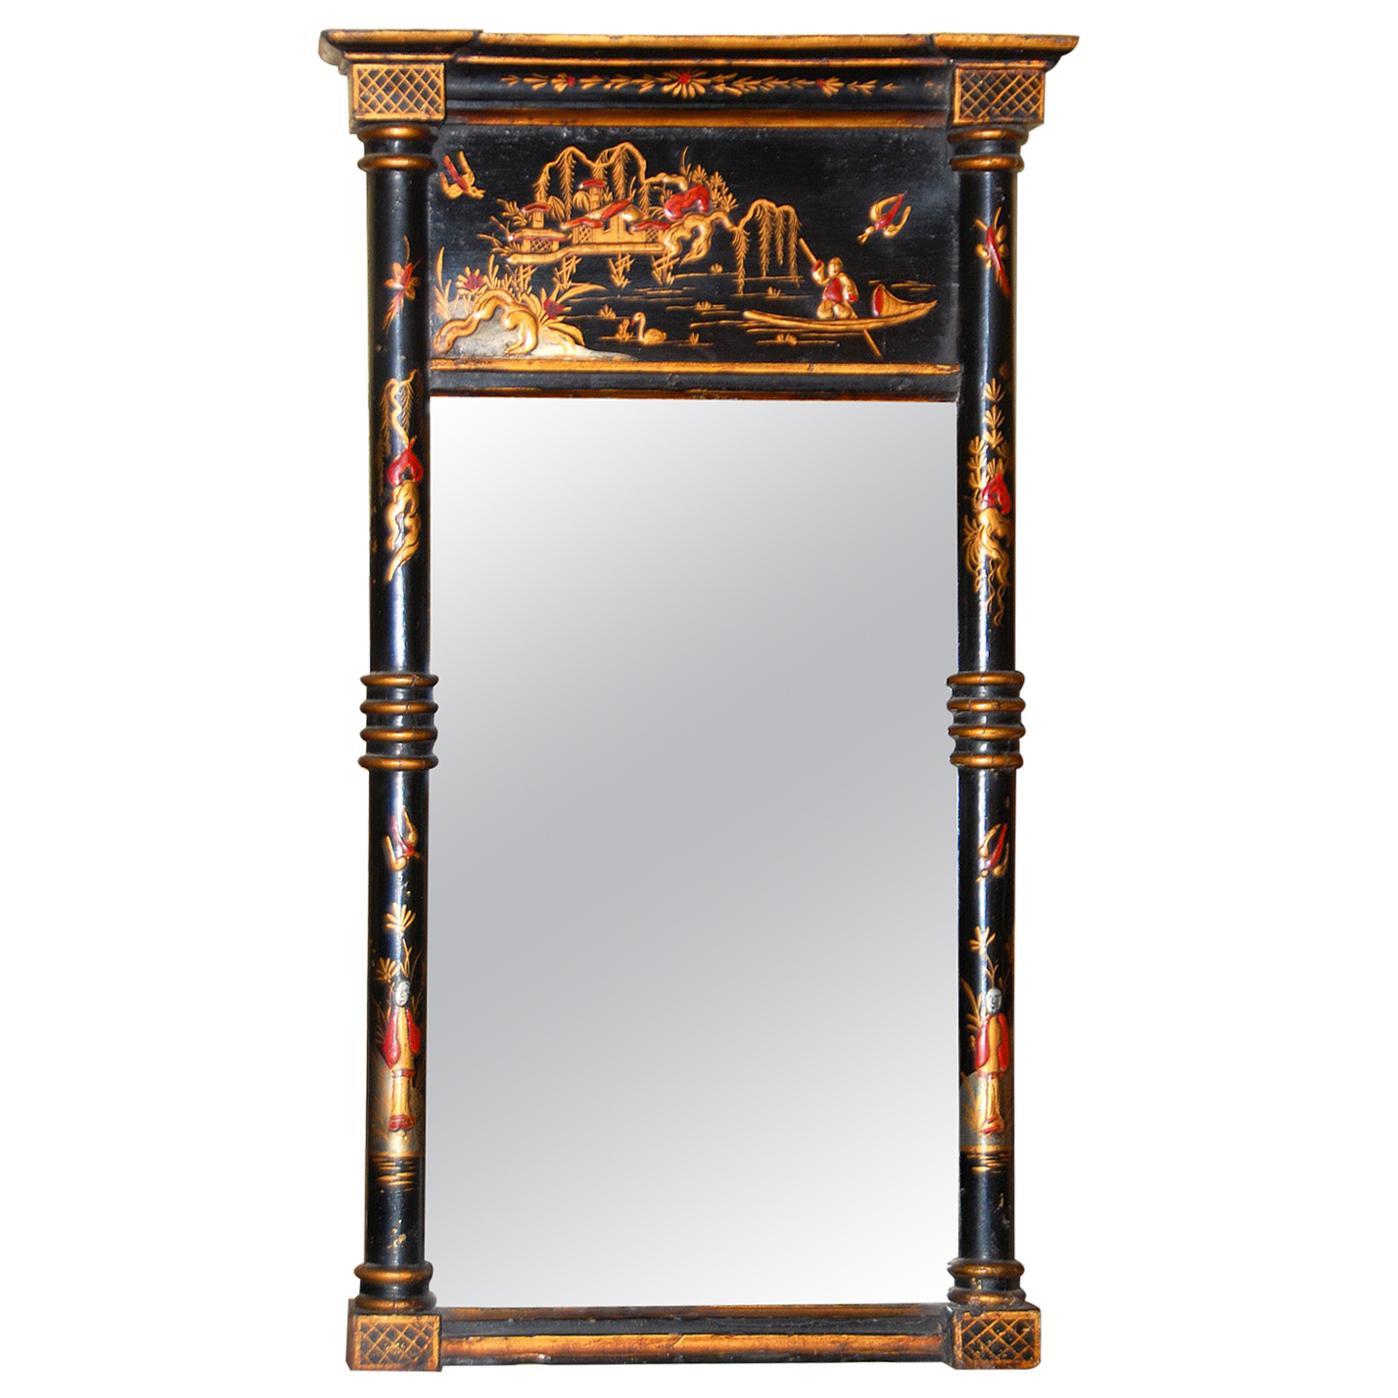 English Georgian Small Chinoiserie Decorated Mirror